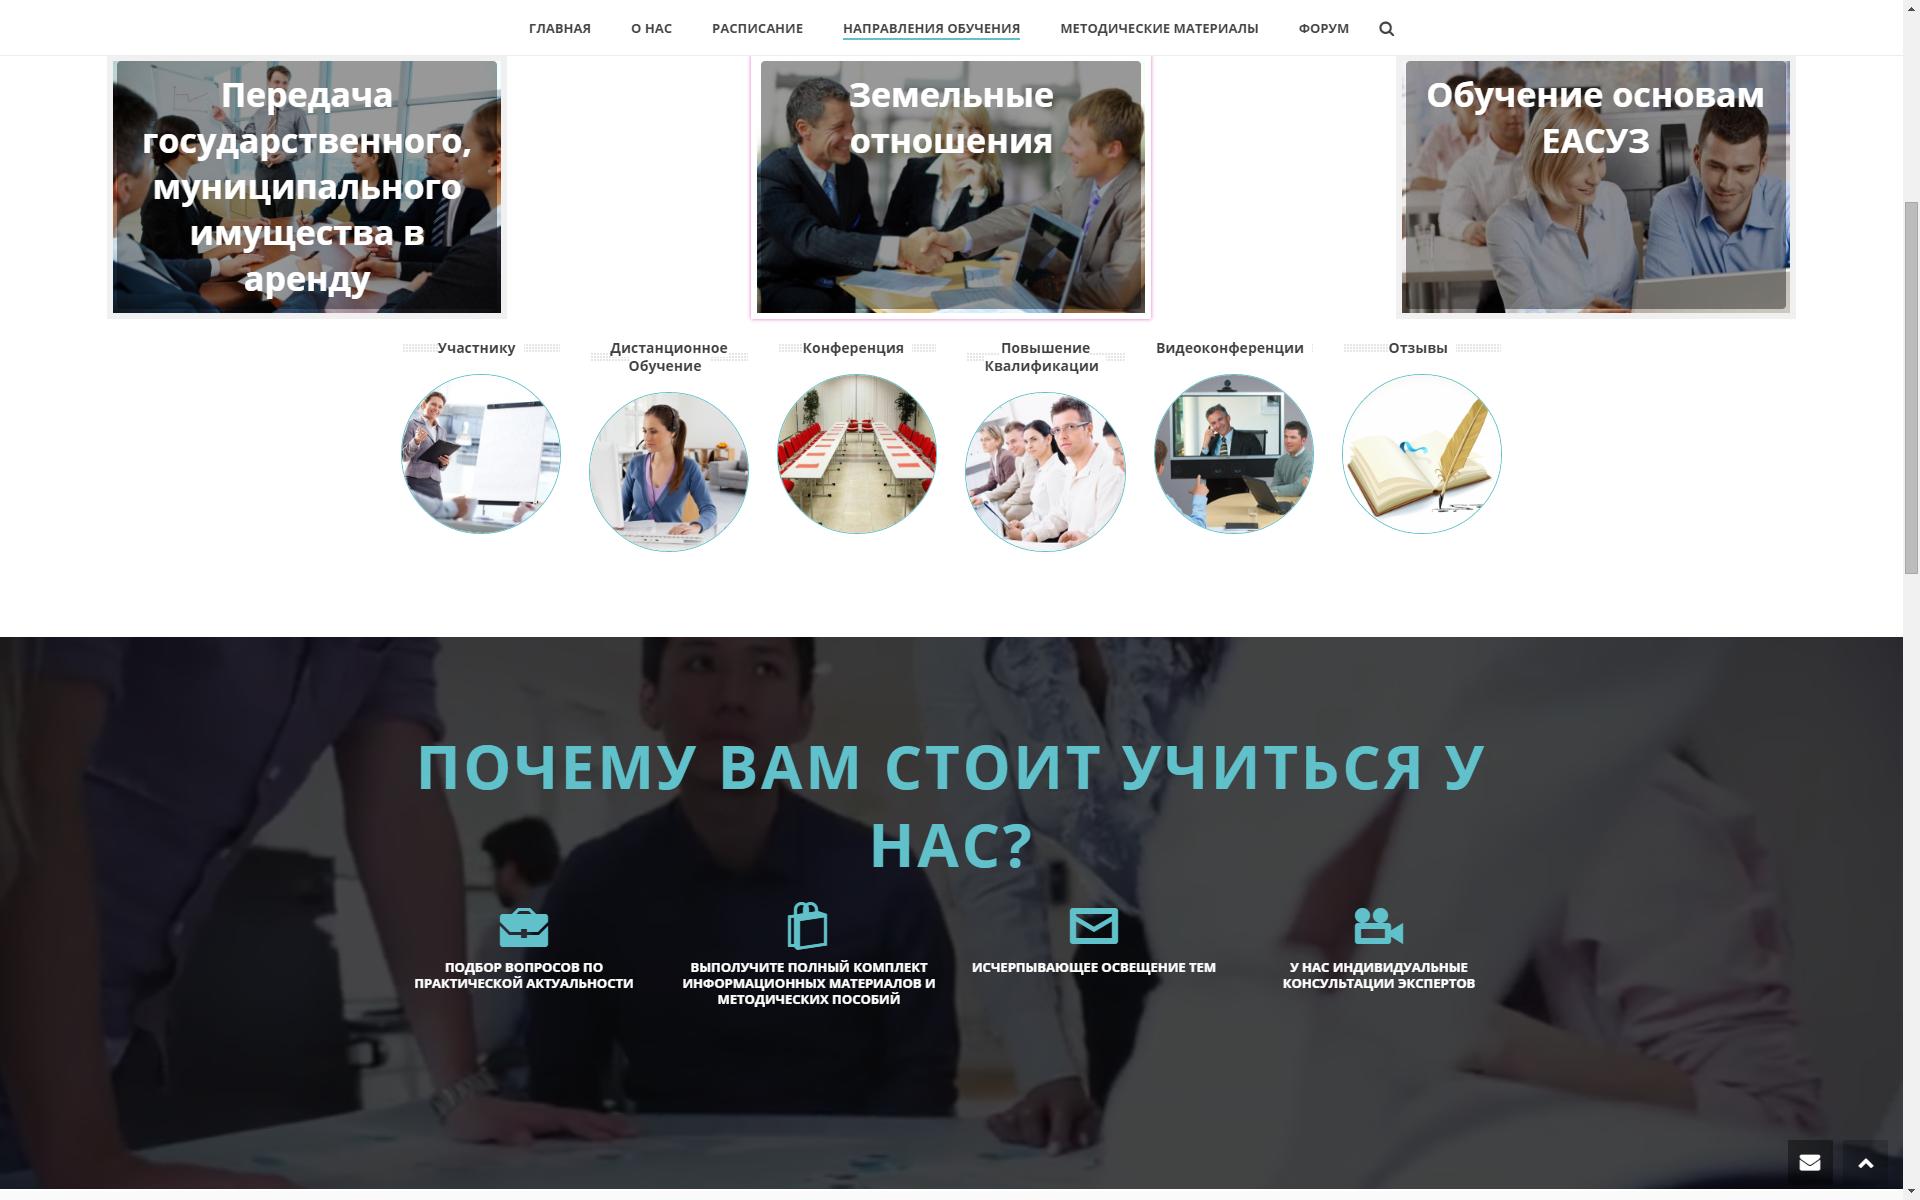 2015-03-16 23-36-46 inuprav.ru